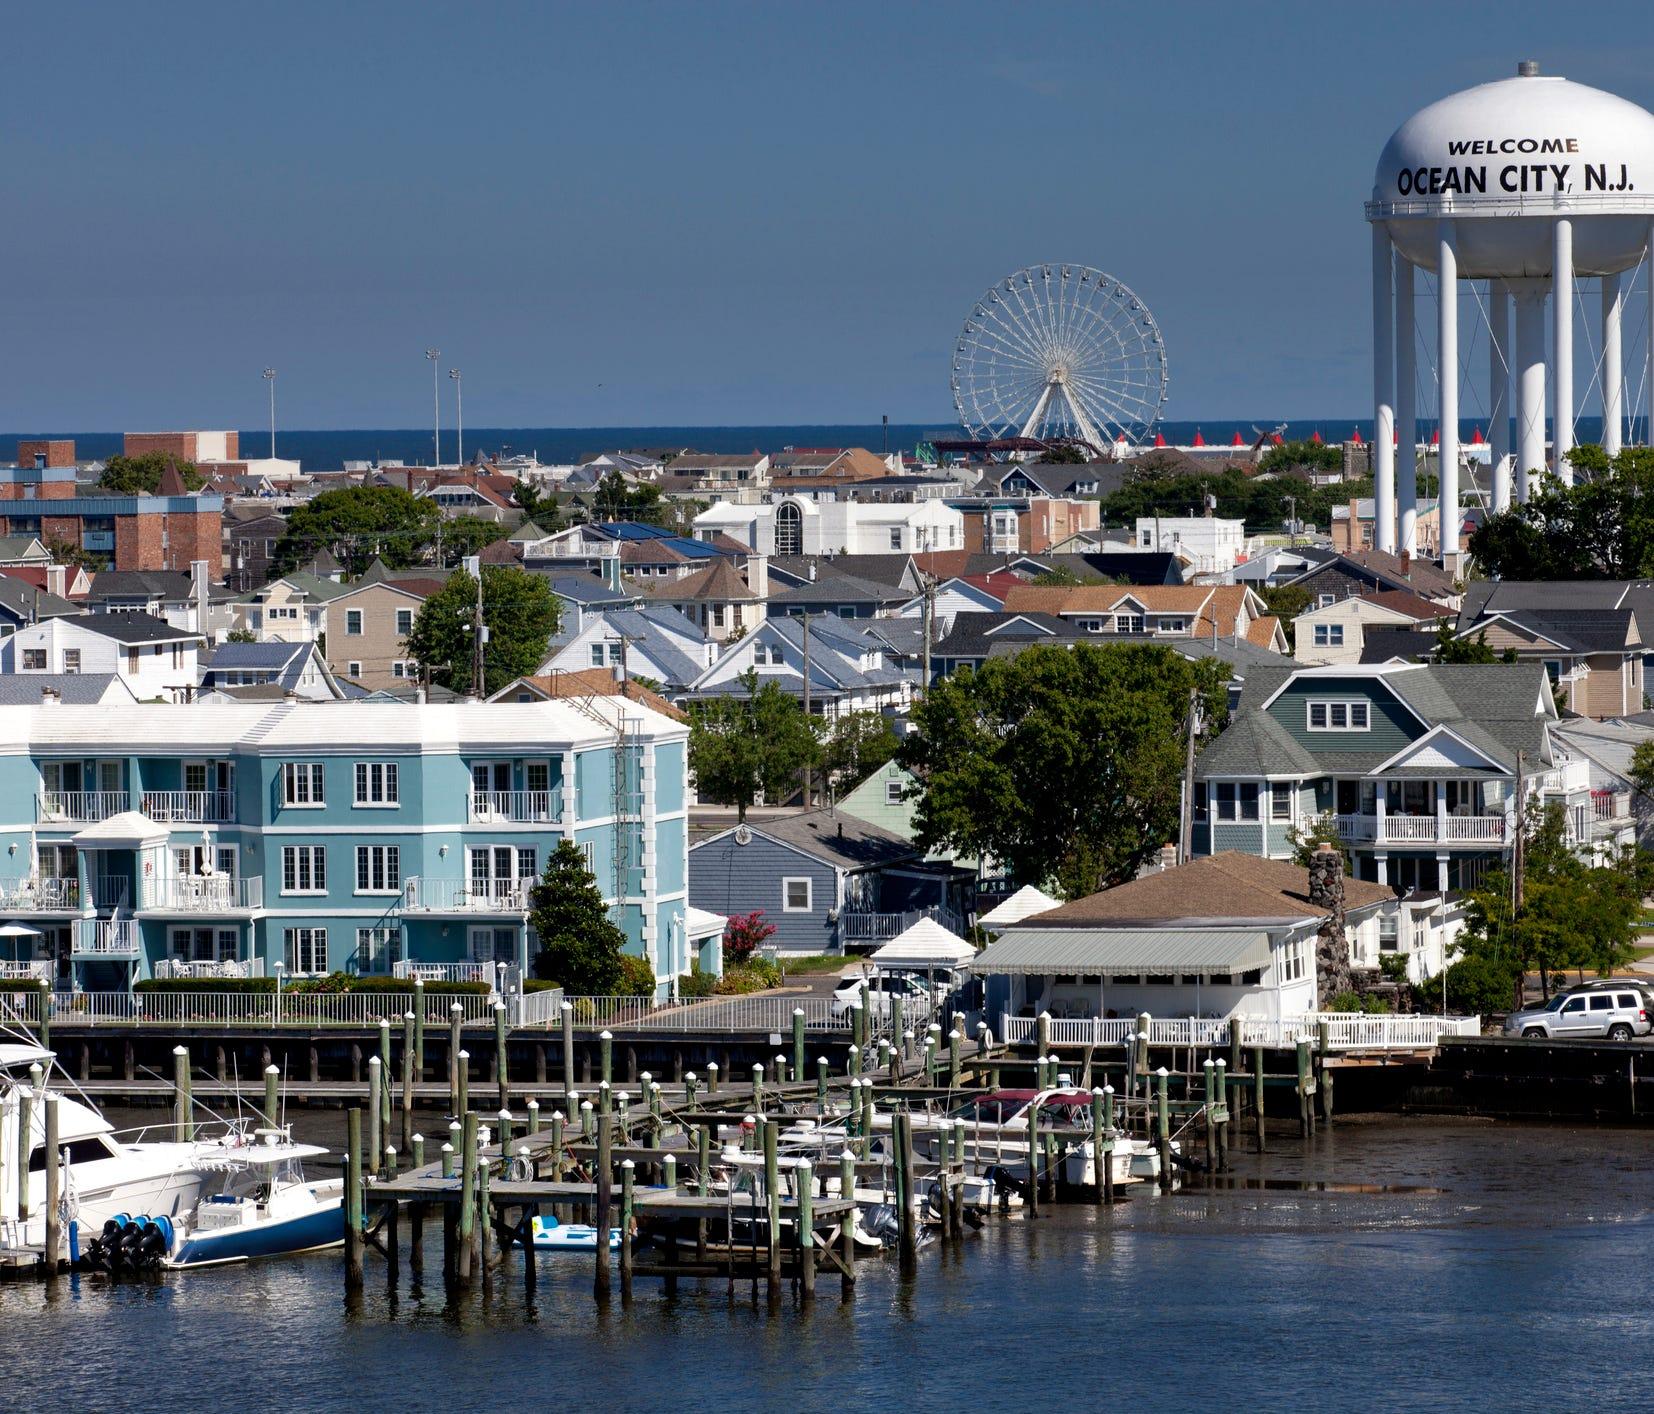 No. 1: Ocean City, N.J.